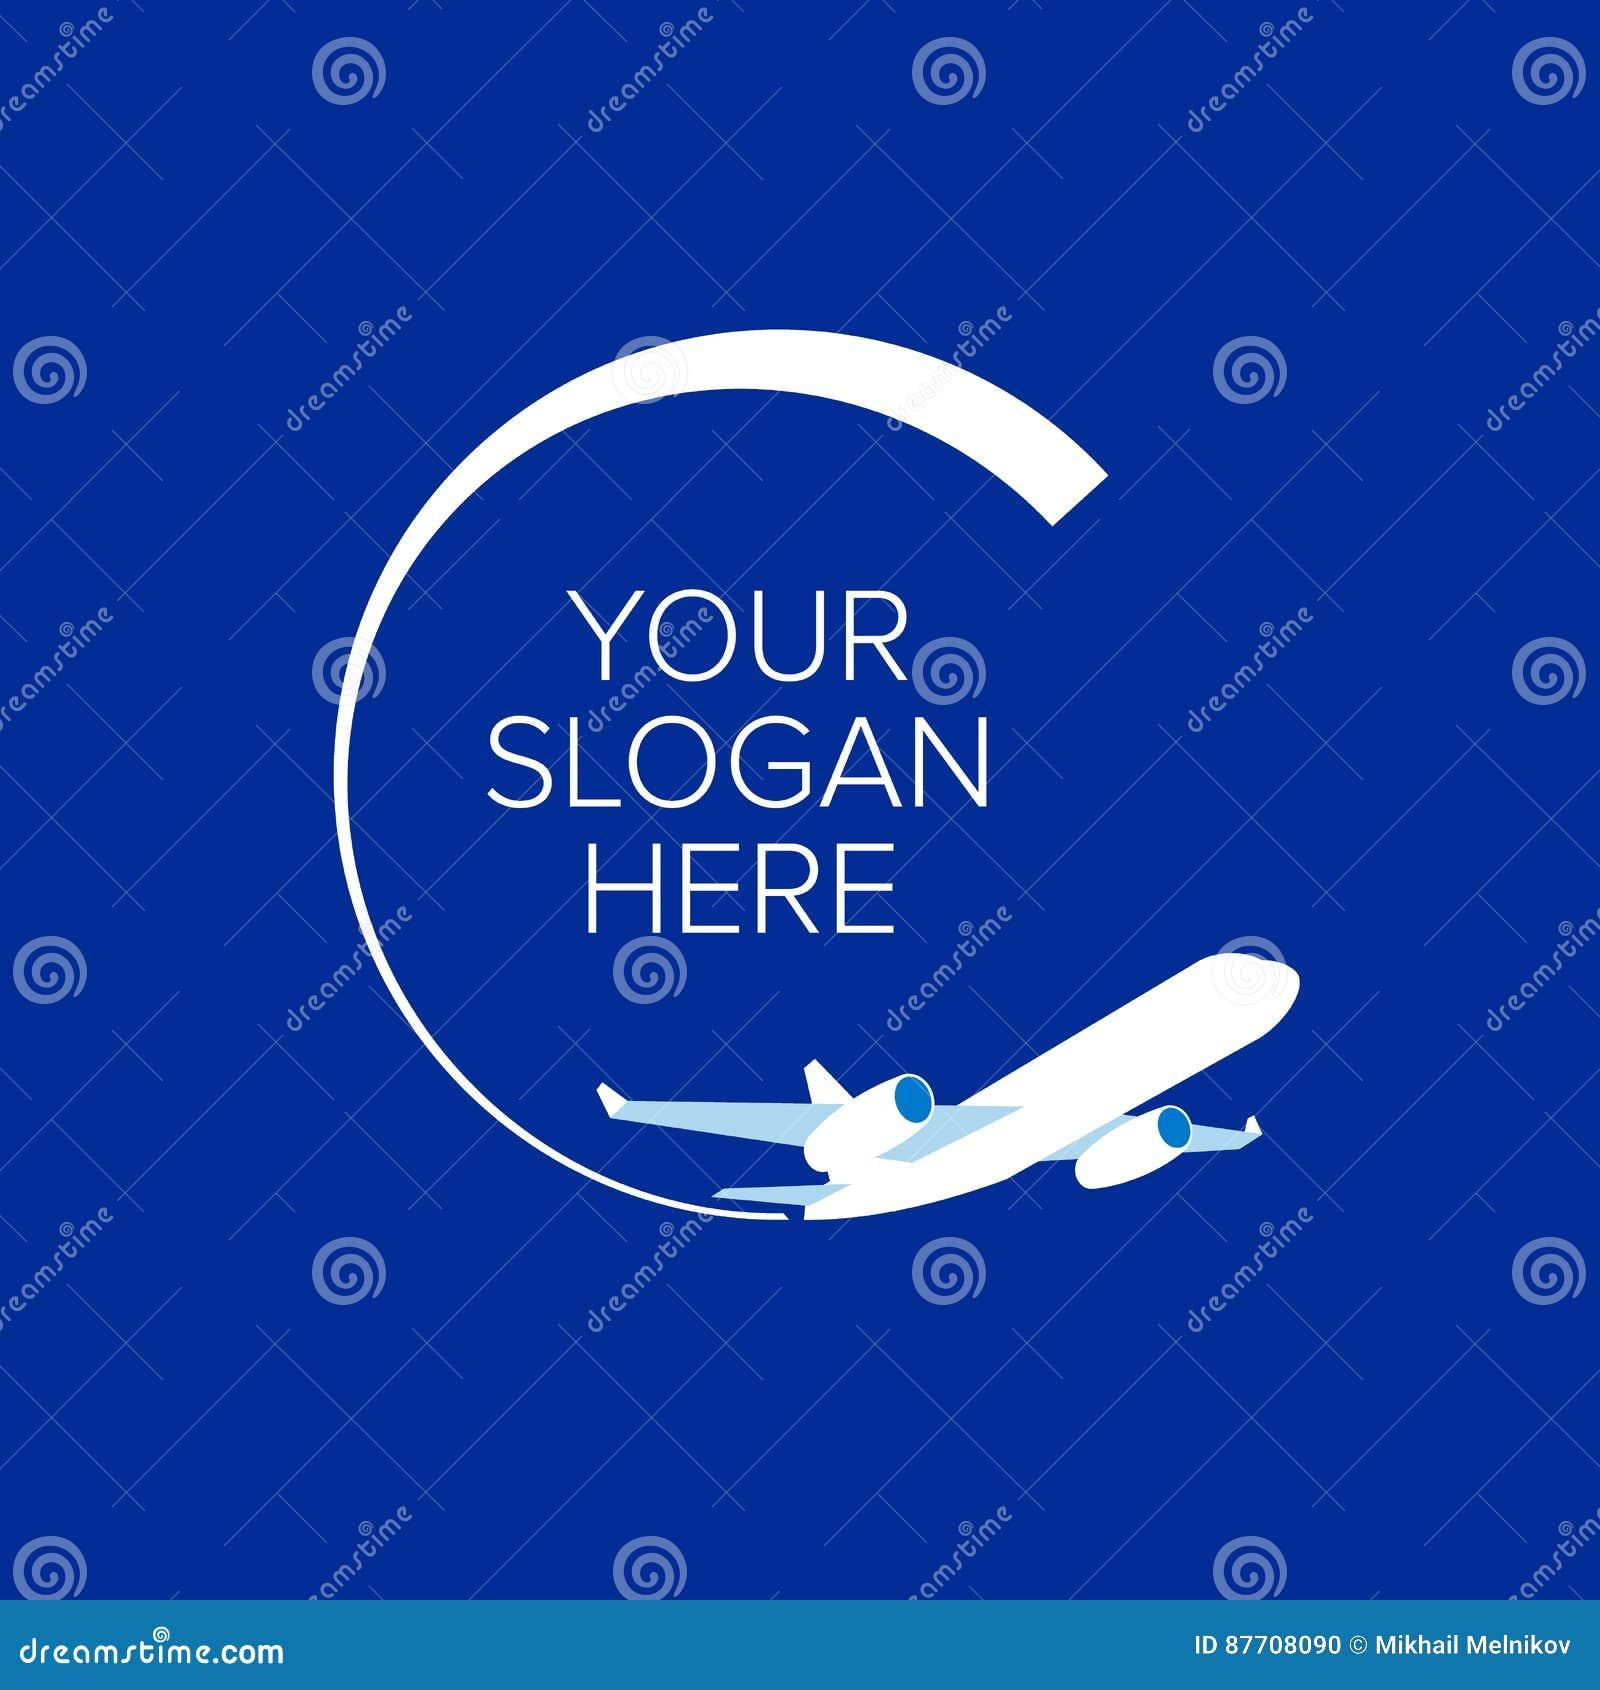 Avion blanc au fond de bleu marine